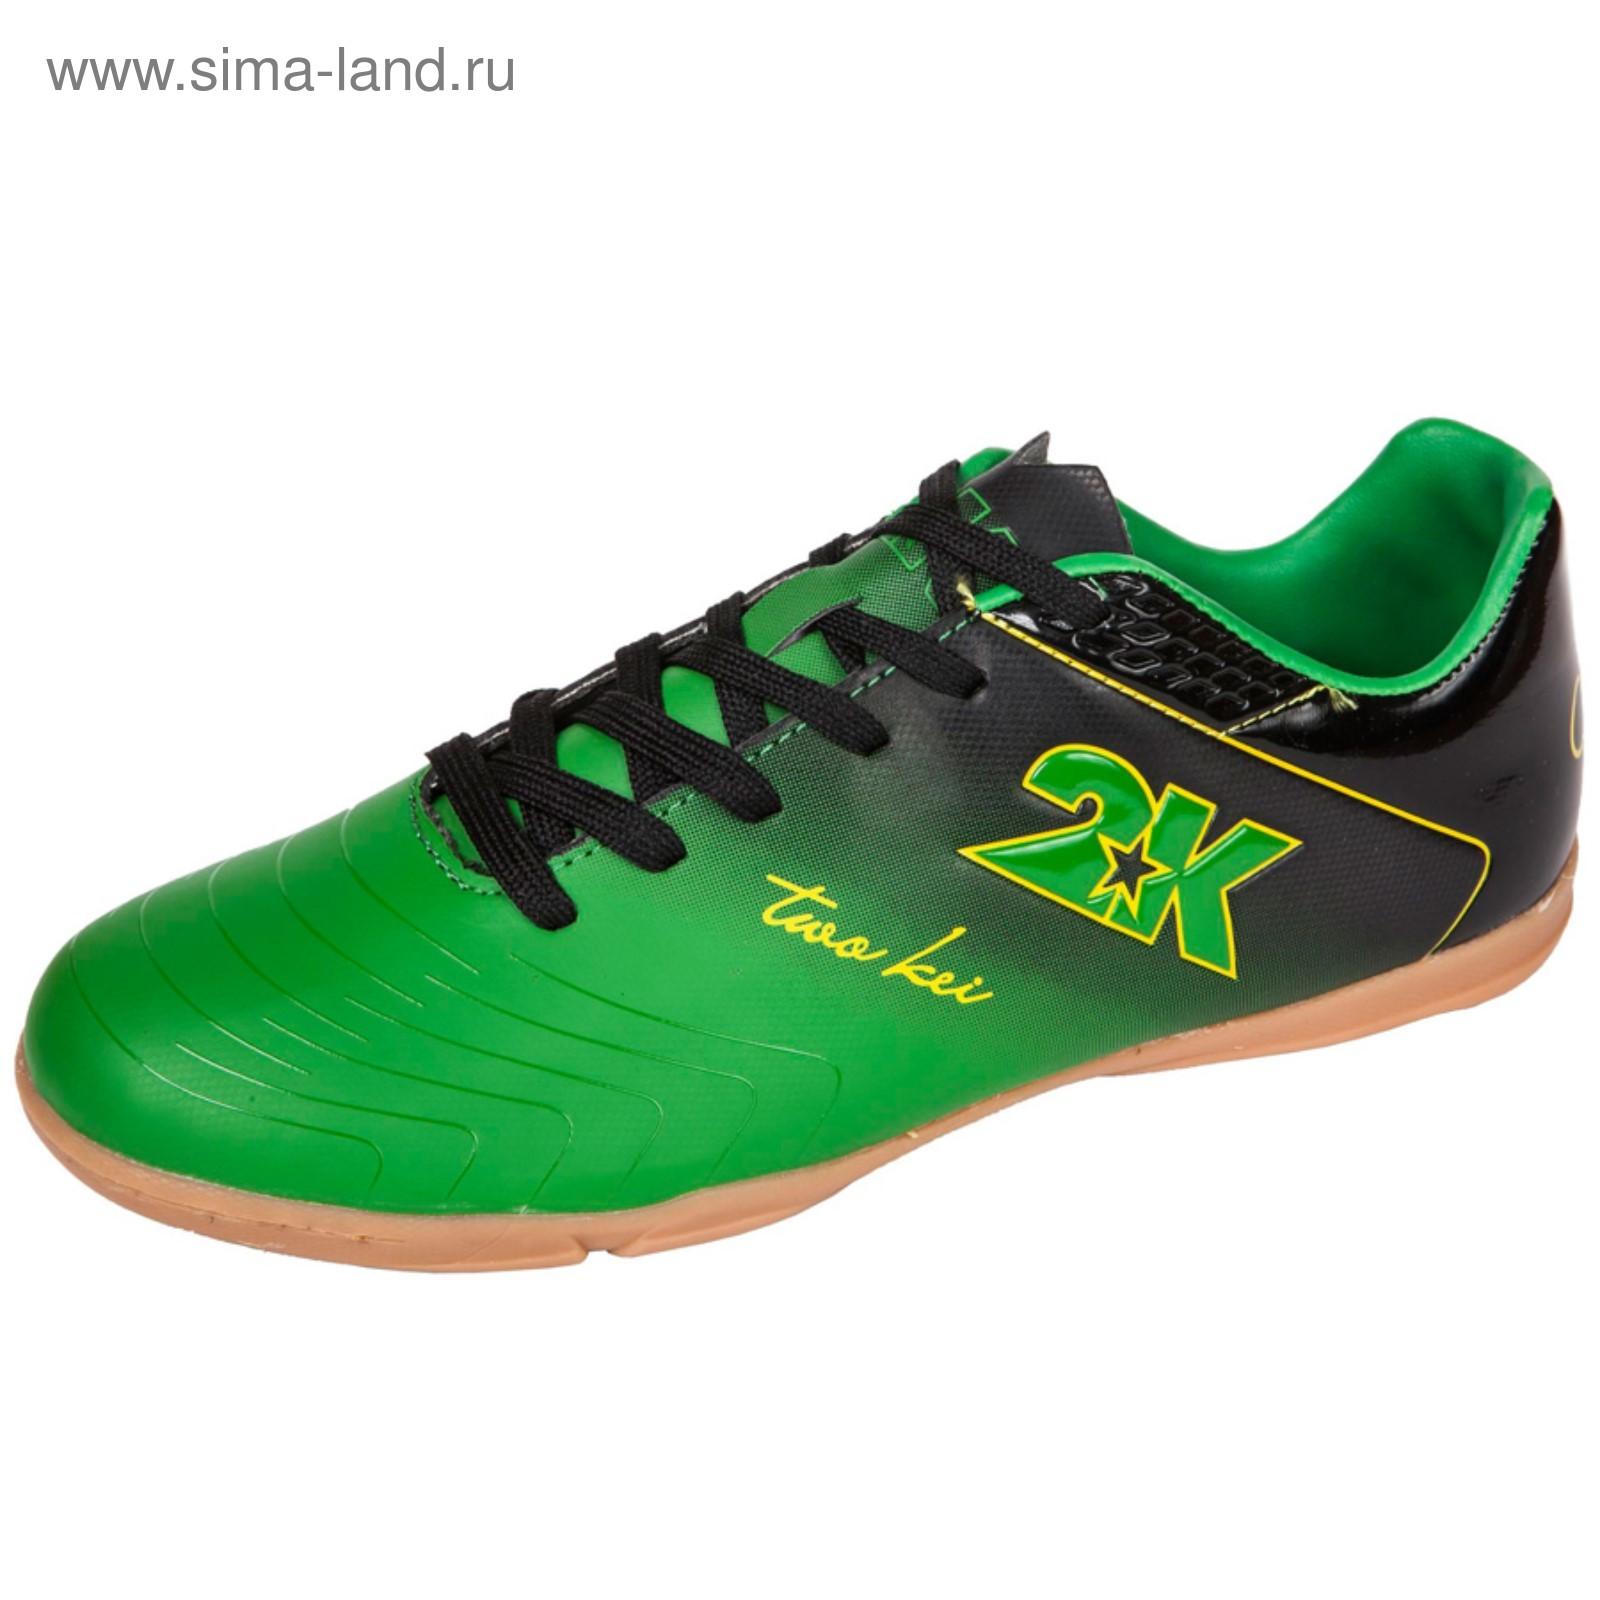 051d8bec Бутсы футзальные 2K Sport Santos, green/black, размер 41 (3280265 ...